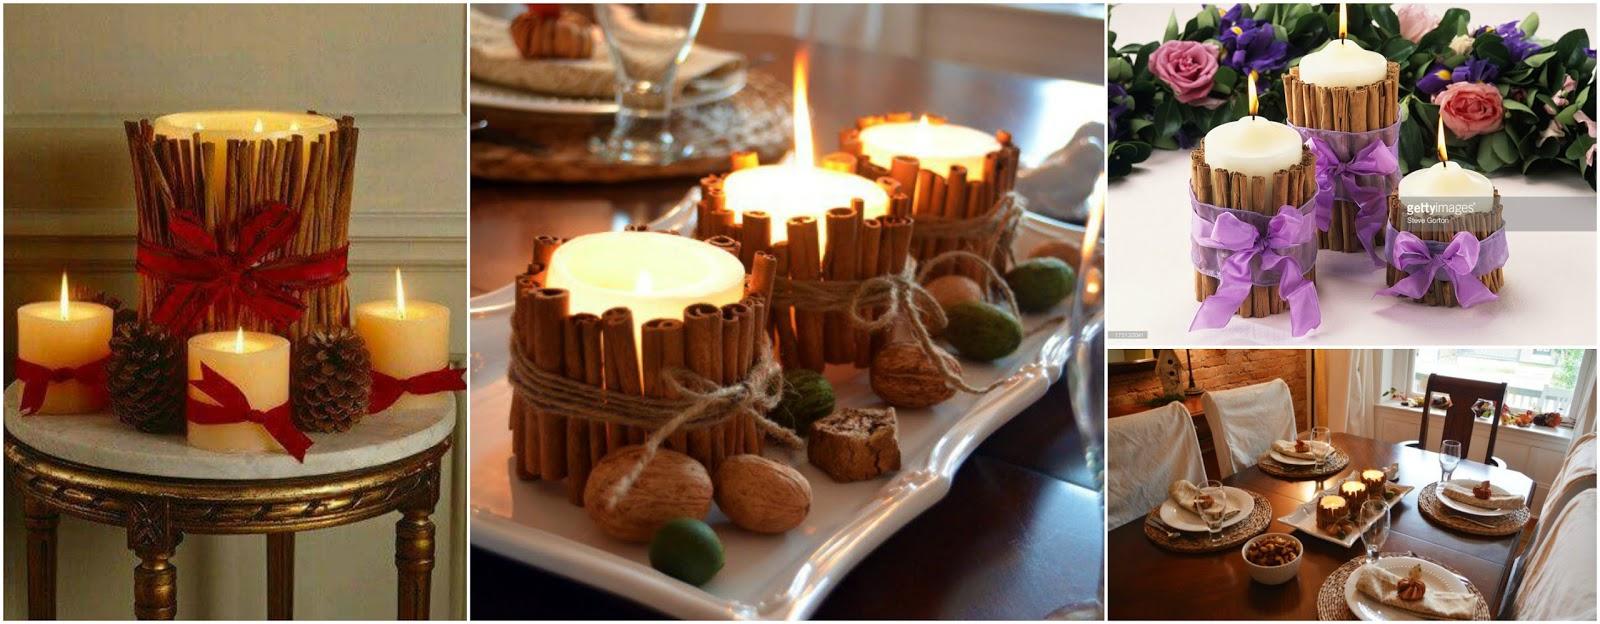 5 ideas f ciles para decorar velas con canela arom ticos - Ideas para decorar velas ...